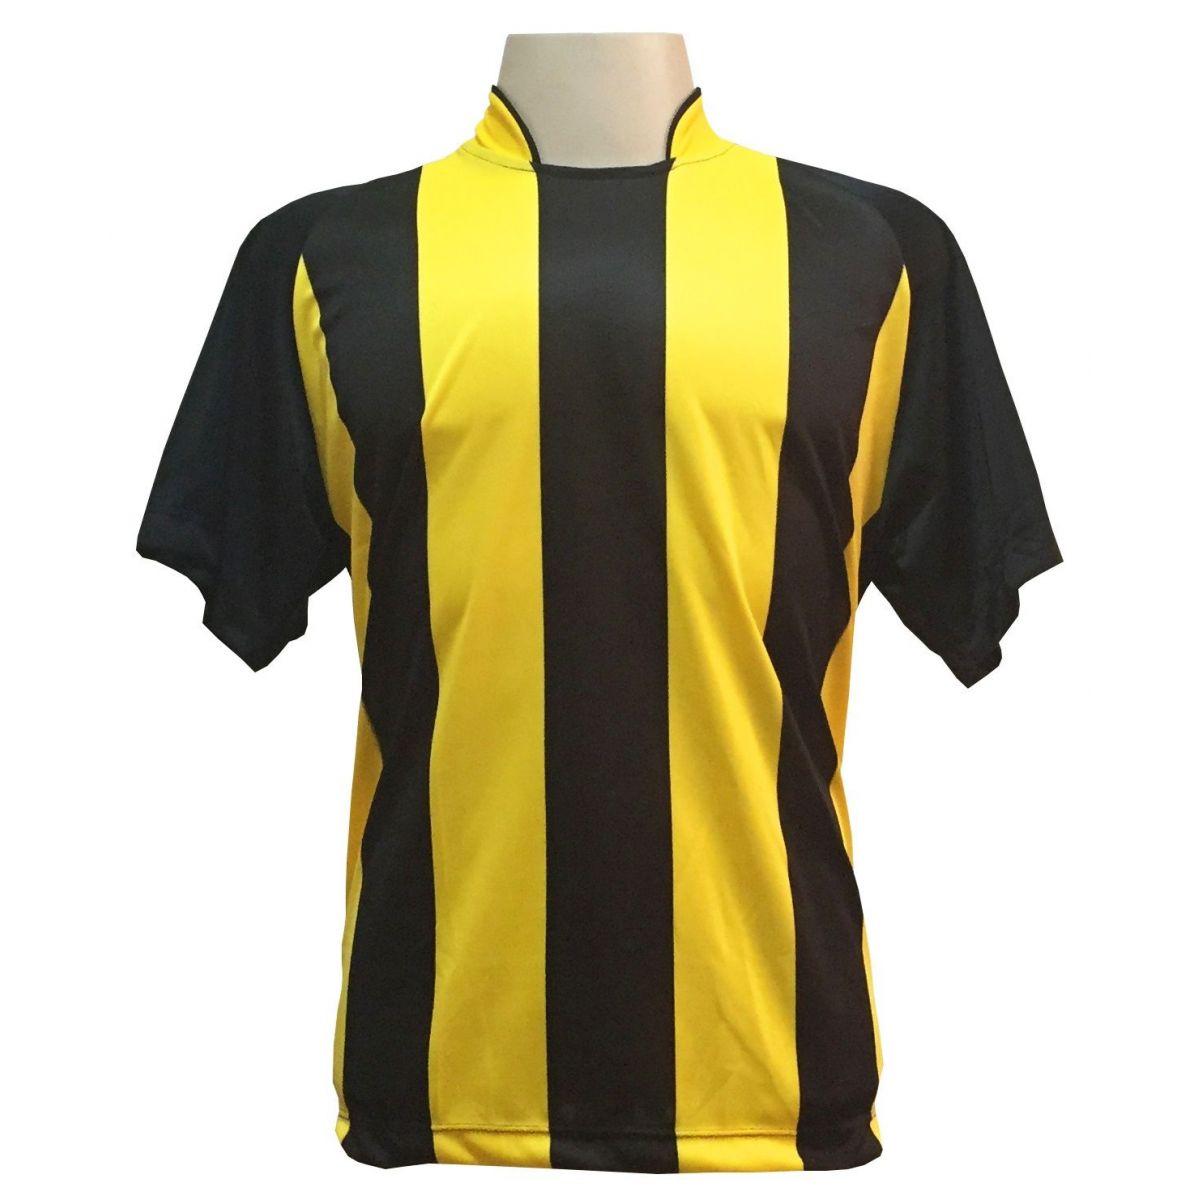 Fardamento Completo modelo Milan 20+2 (20 camisas Preto/Amarelo + 20 calções modelo Copa Preto/Amarelo + 20 pares de meiões Preto + 2 conjuntos de goleiro) + Brindes